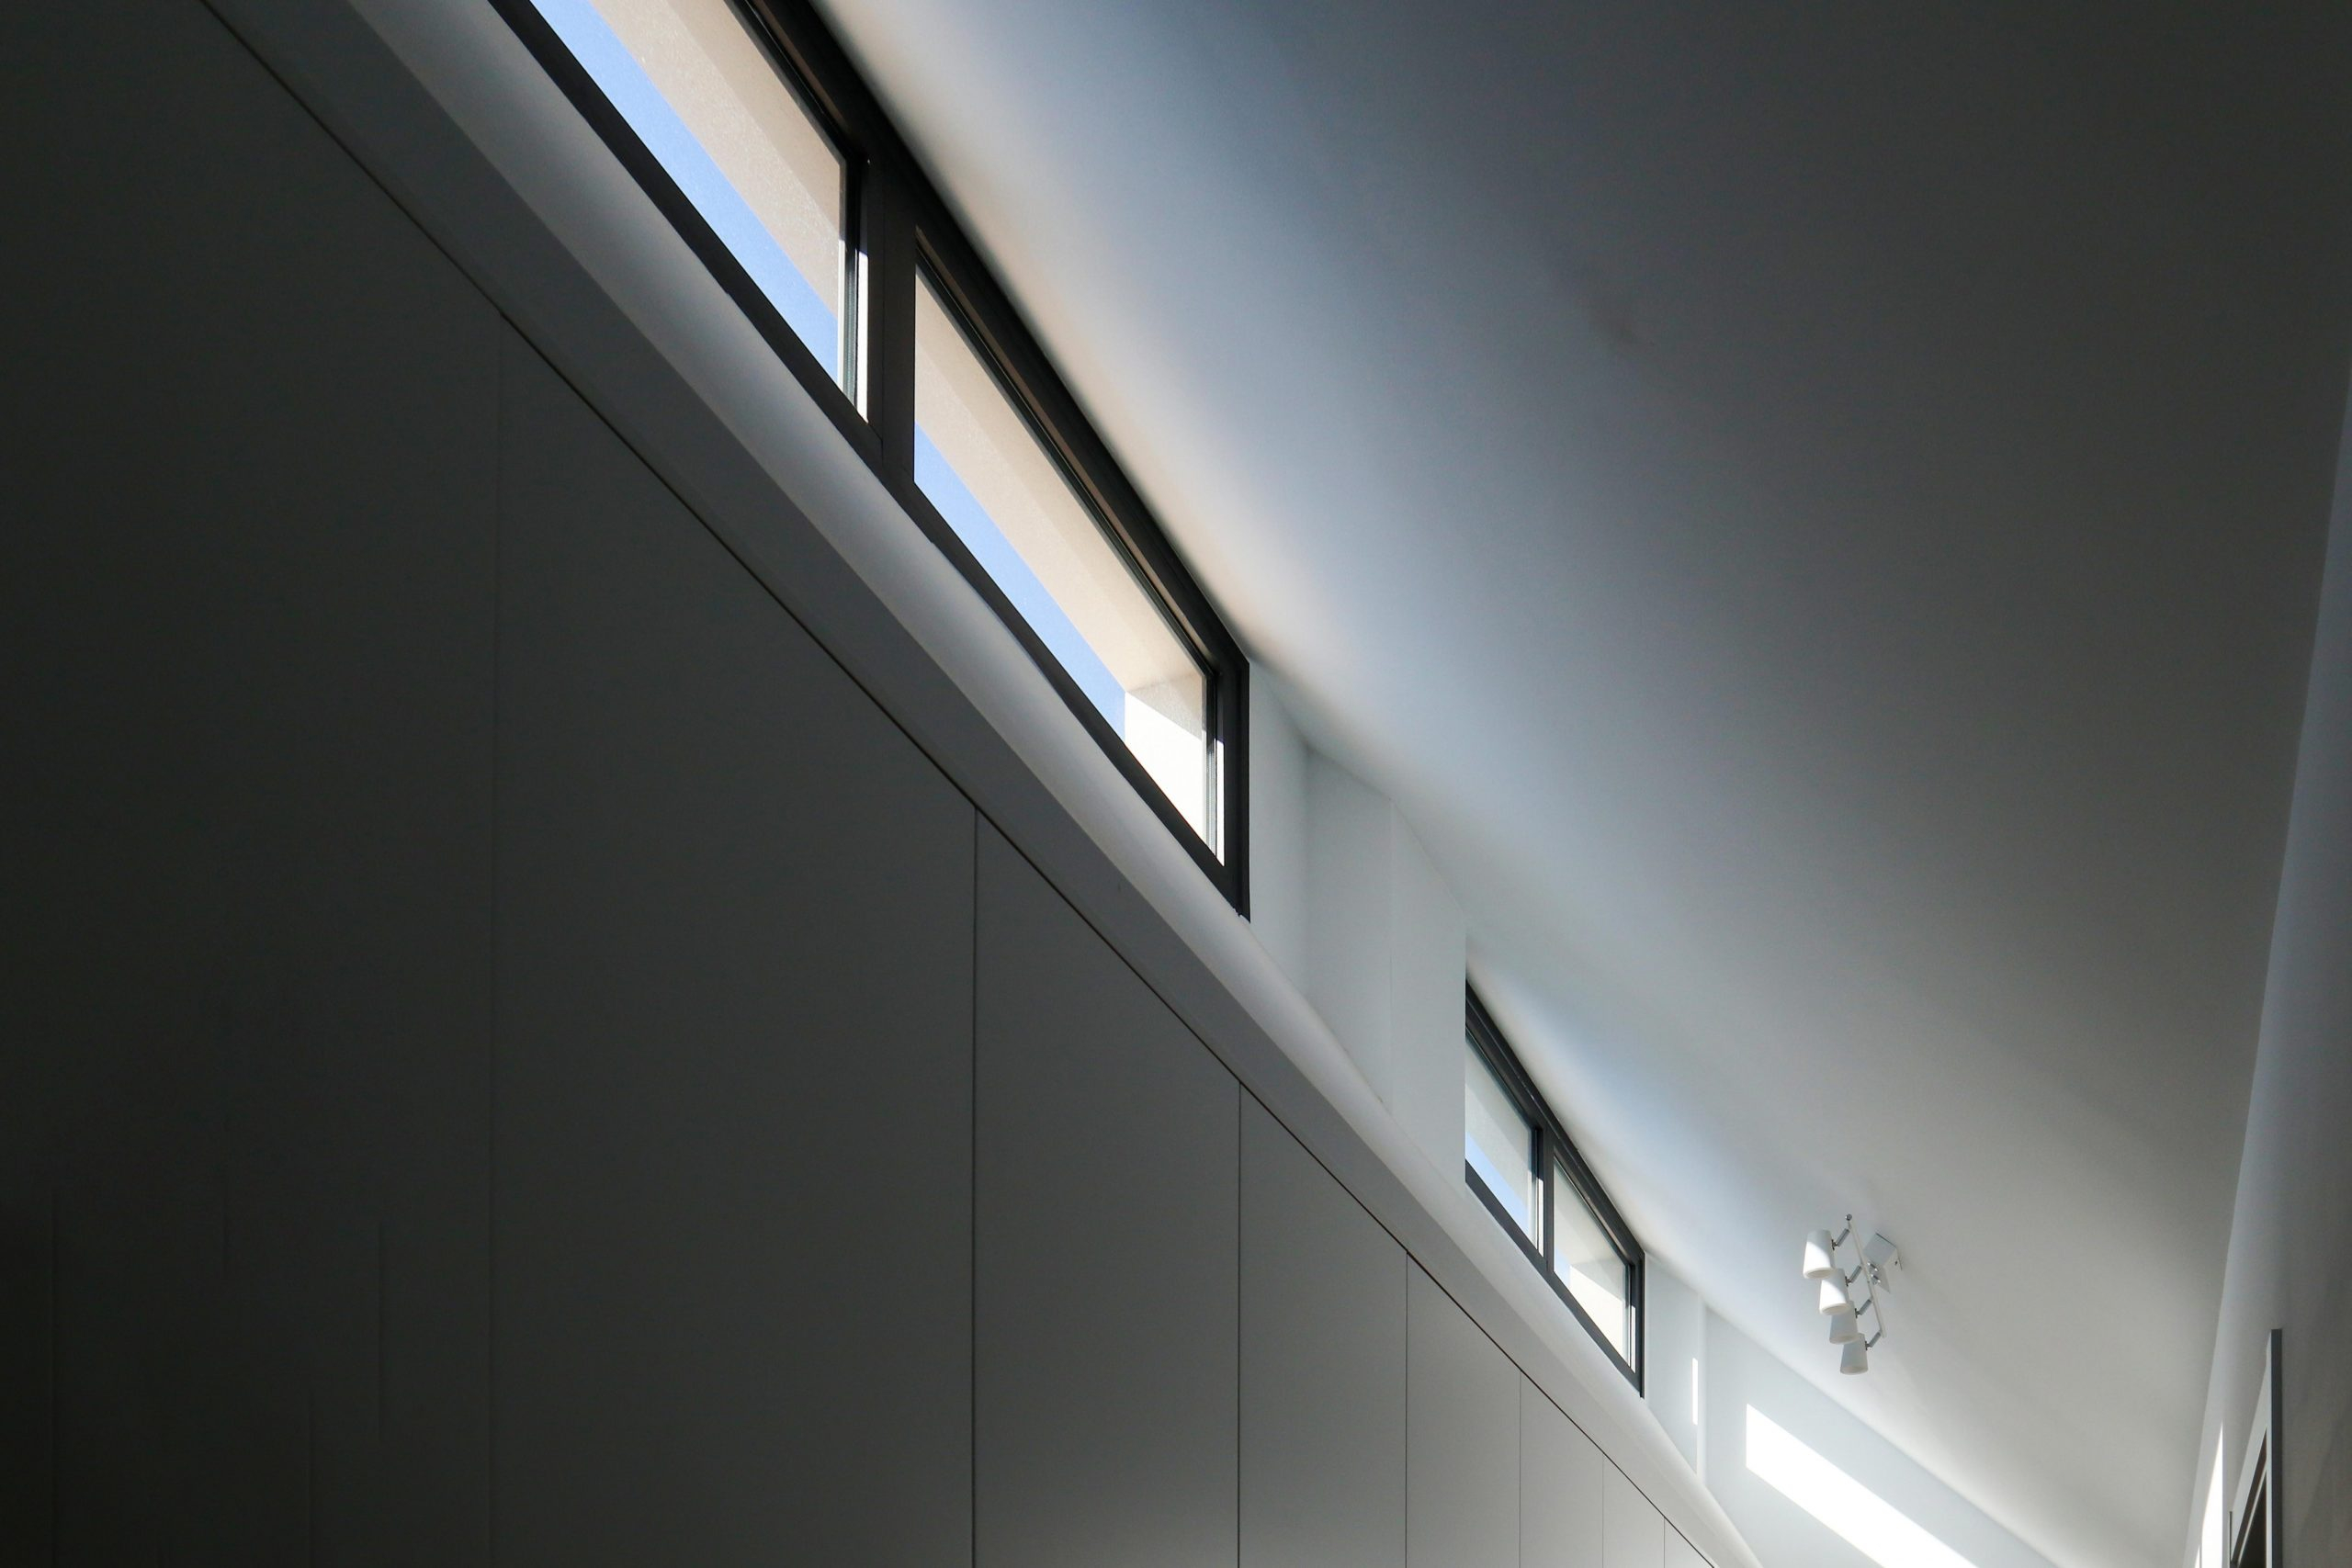 Ventana de aluminio sobre armario para arquitectura unifamiliar